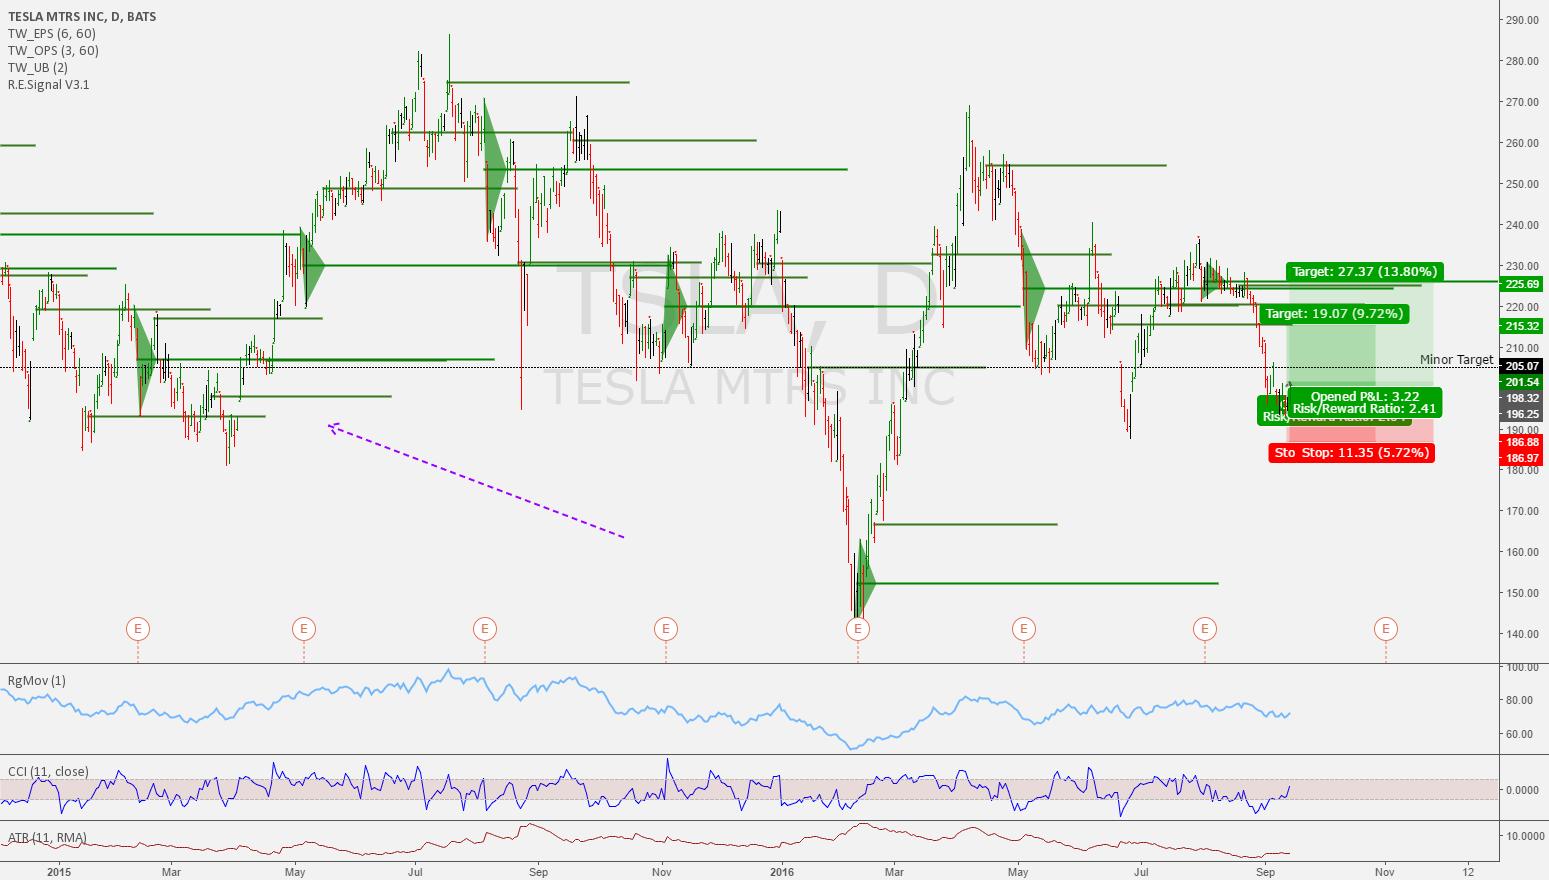 TSLA Moving up nicely